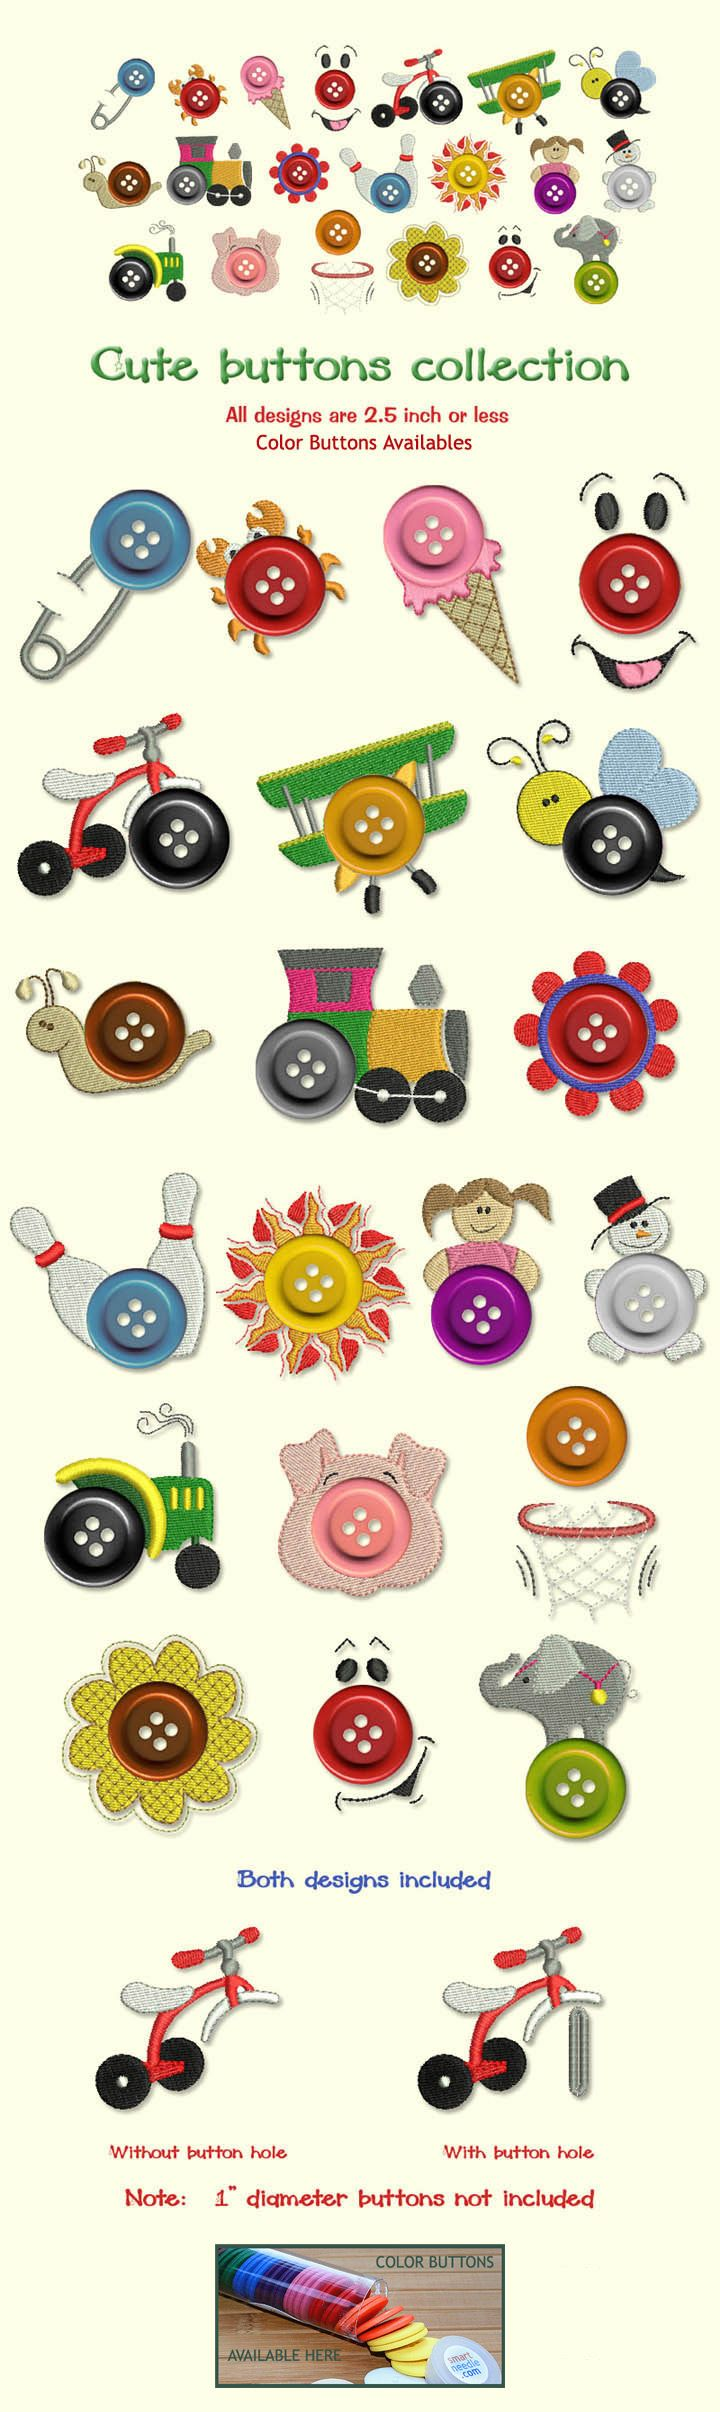 ButtonArtMuseum.com - Cute Buttons Miniature Embroidery Designs Free Embroidery Design Patterns Applique